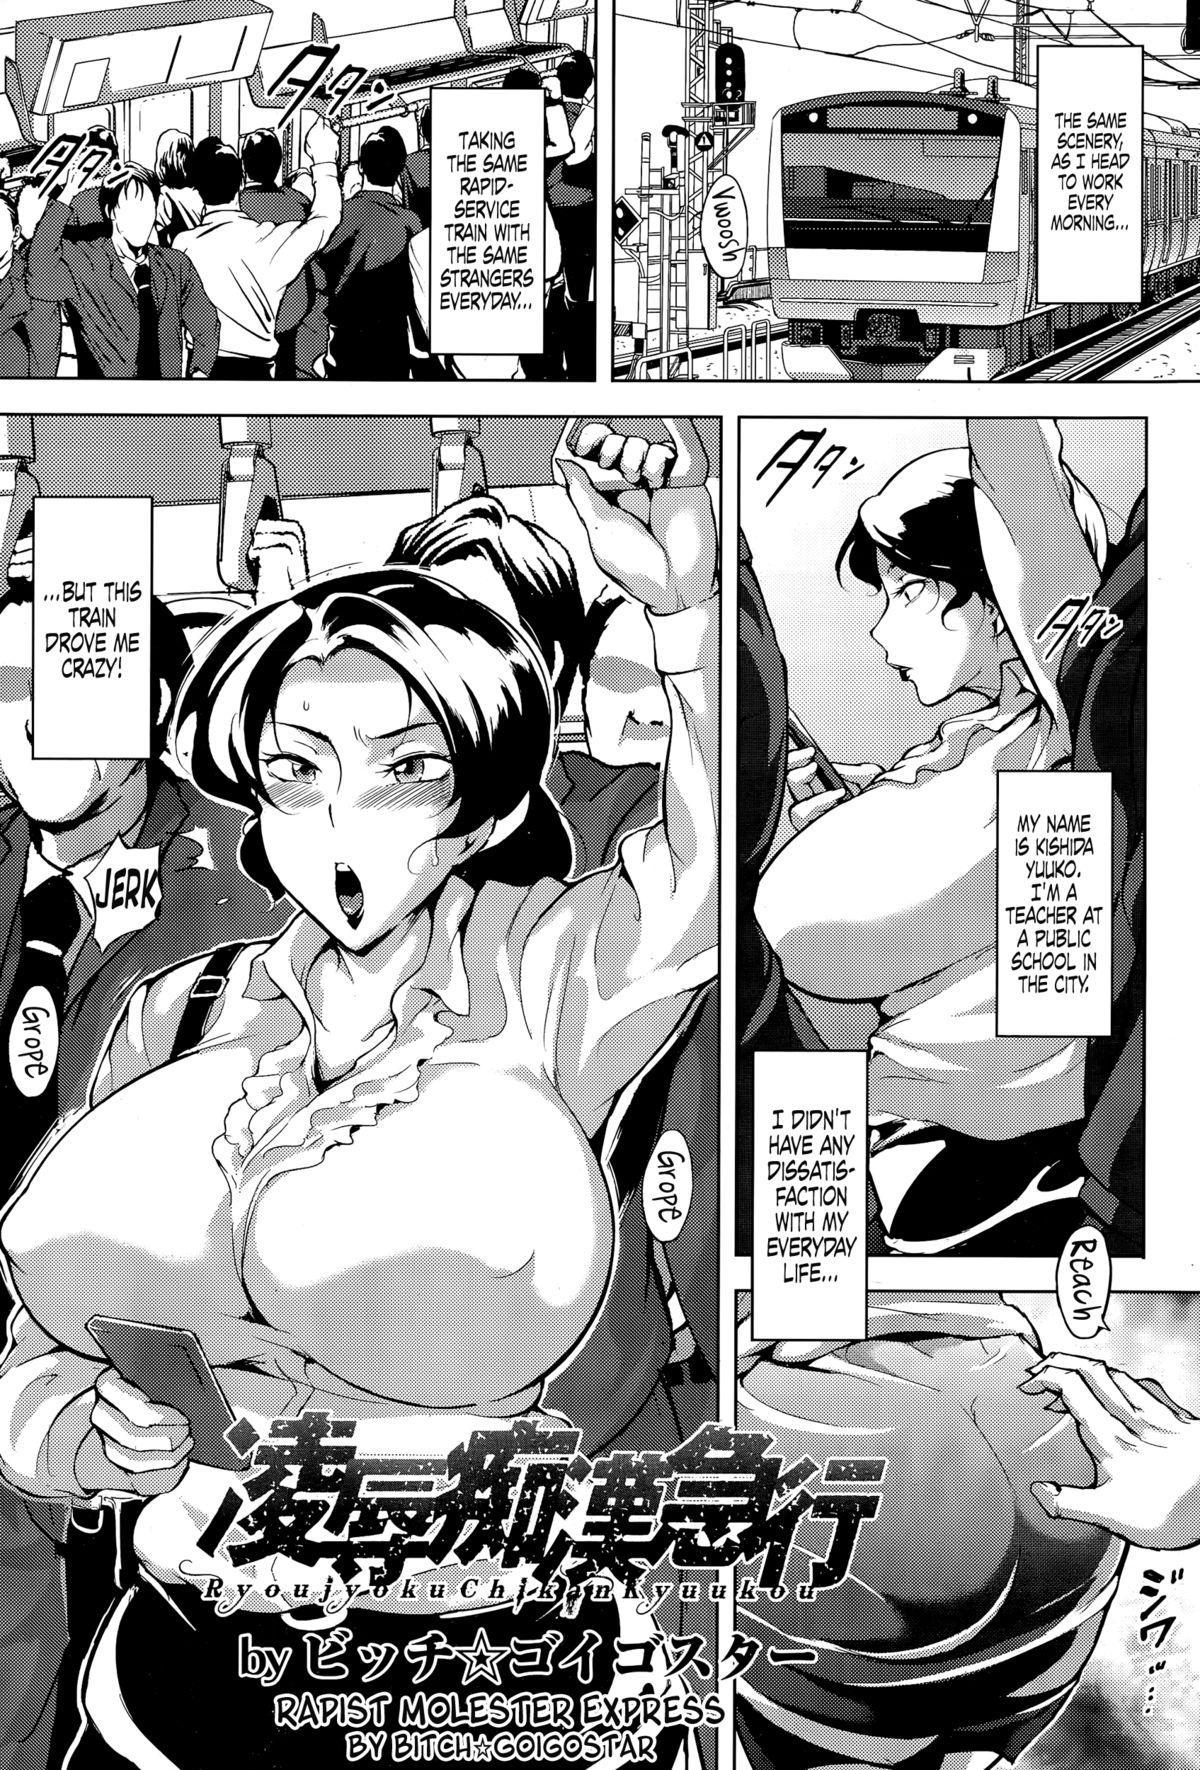 Ryoujyoku Chikan Kyuukou | Rapist Molester Express 0